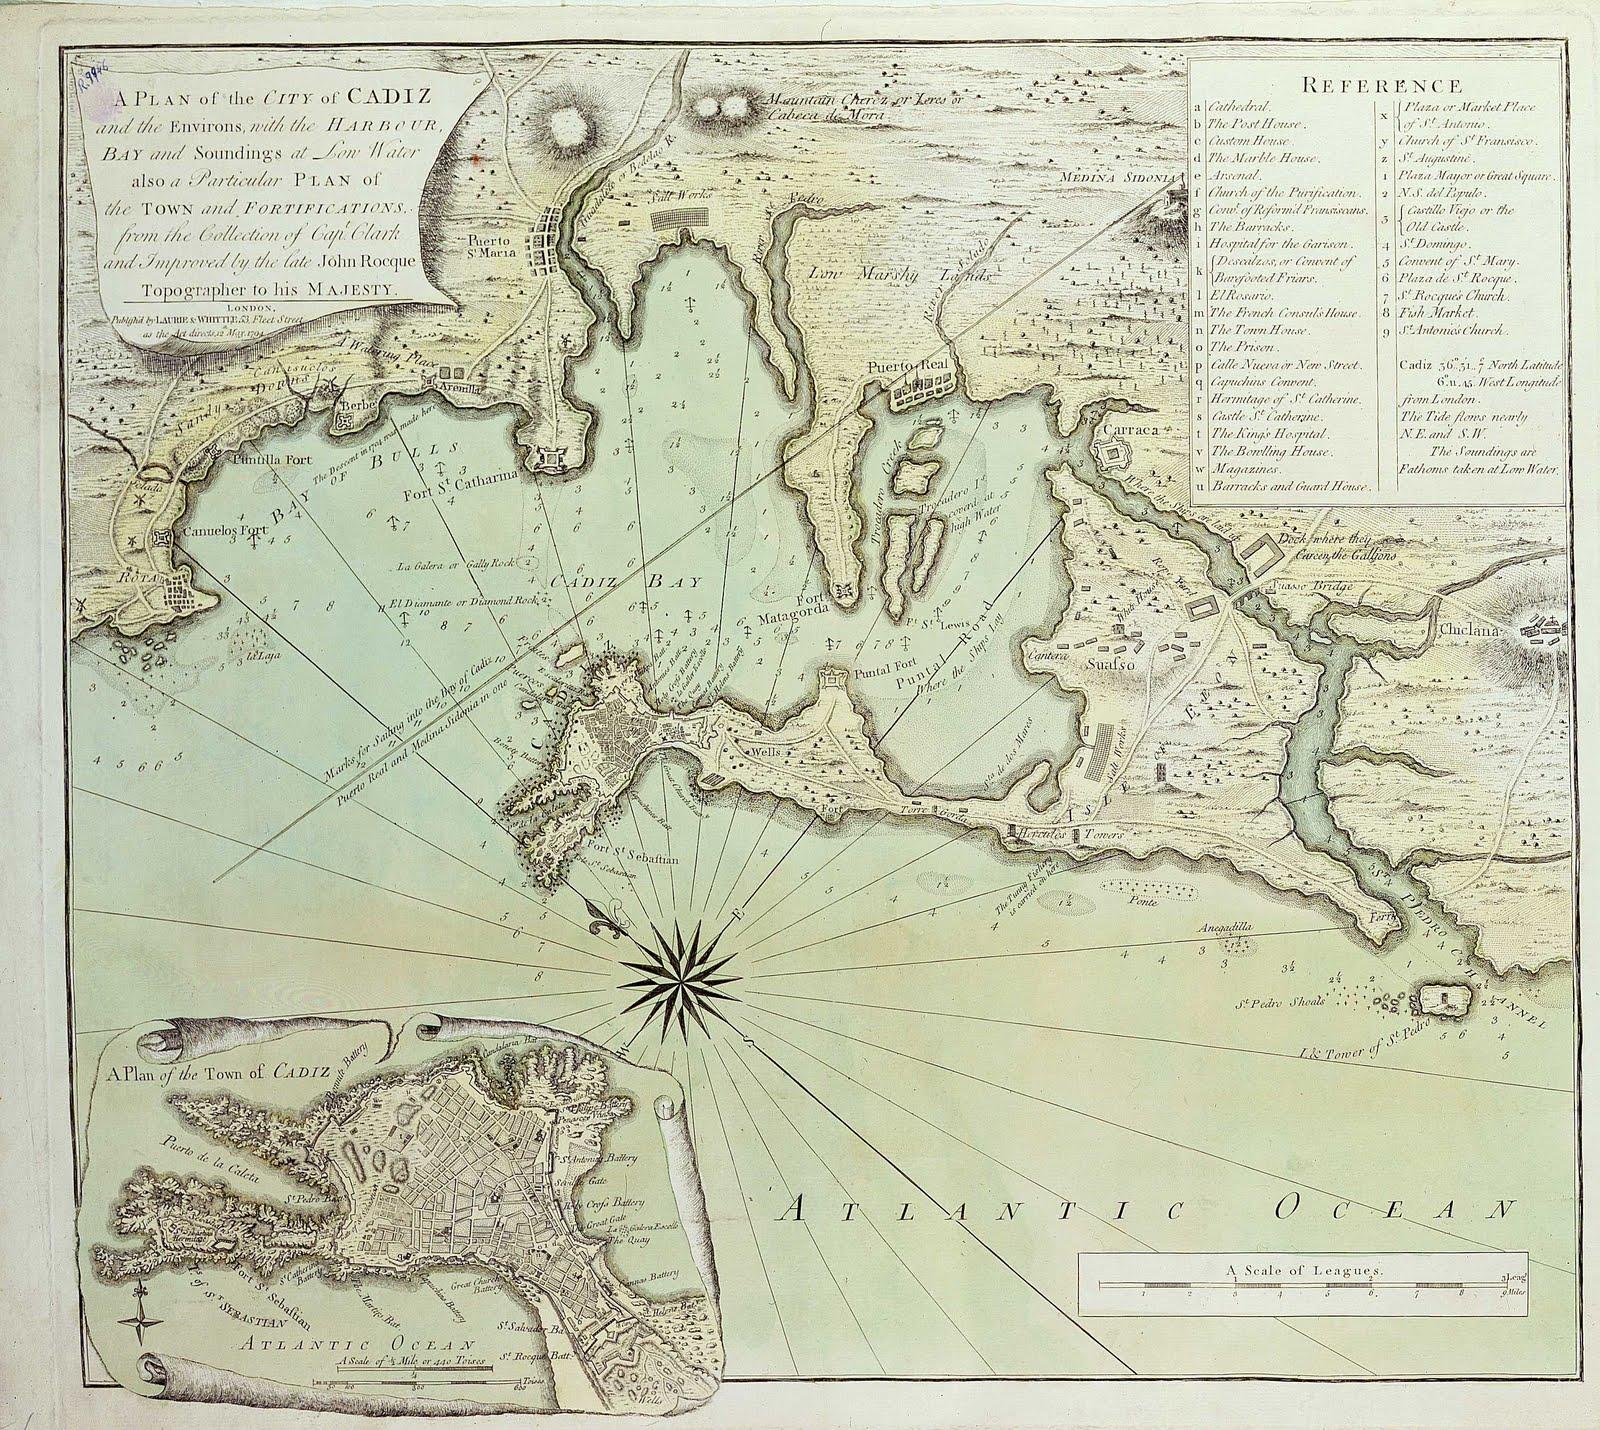 Ciudad de Cádiz 1794